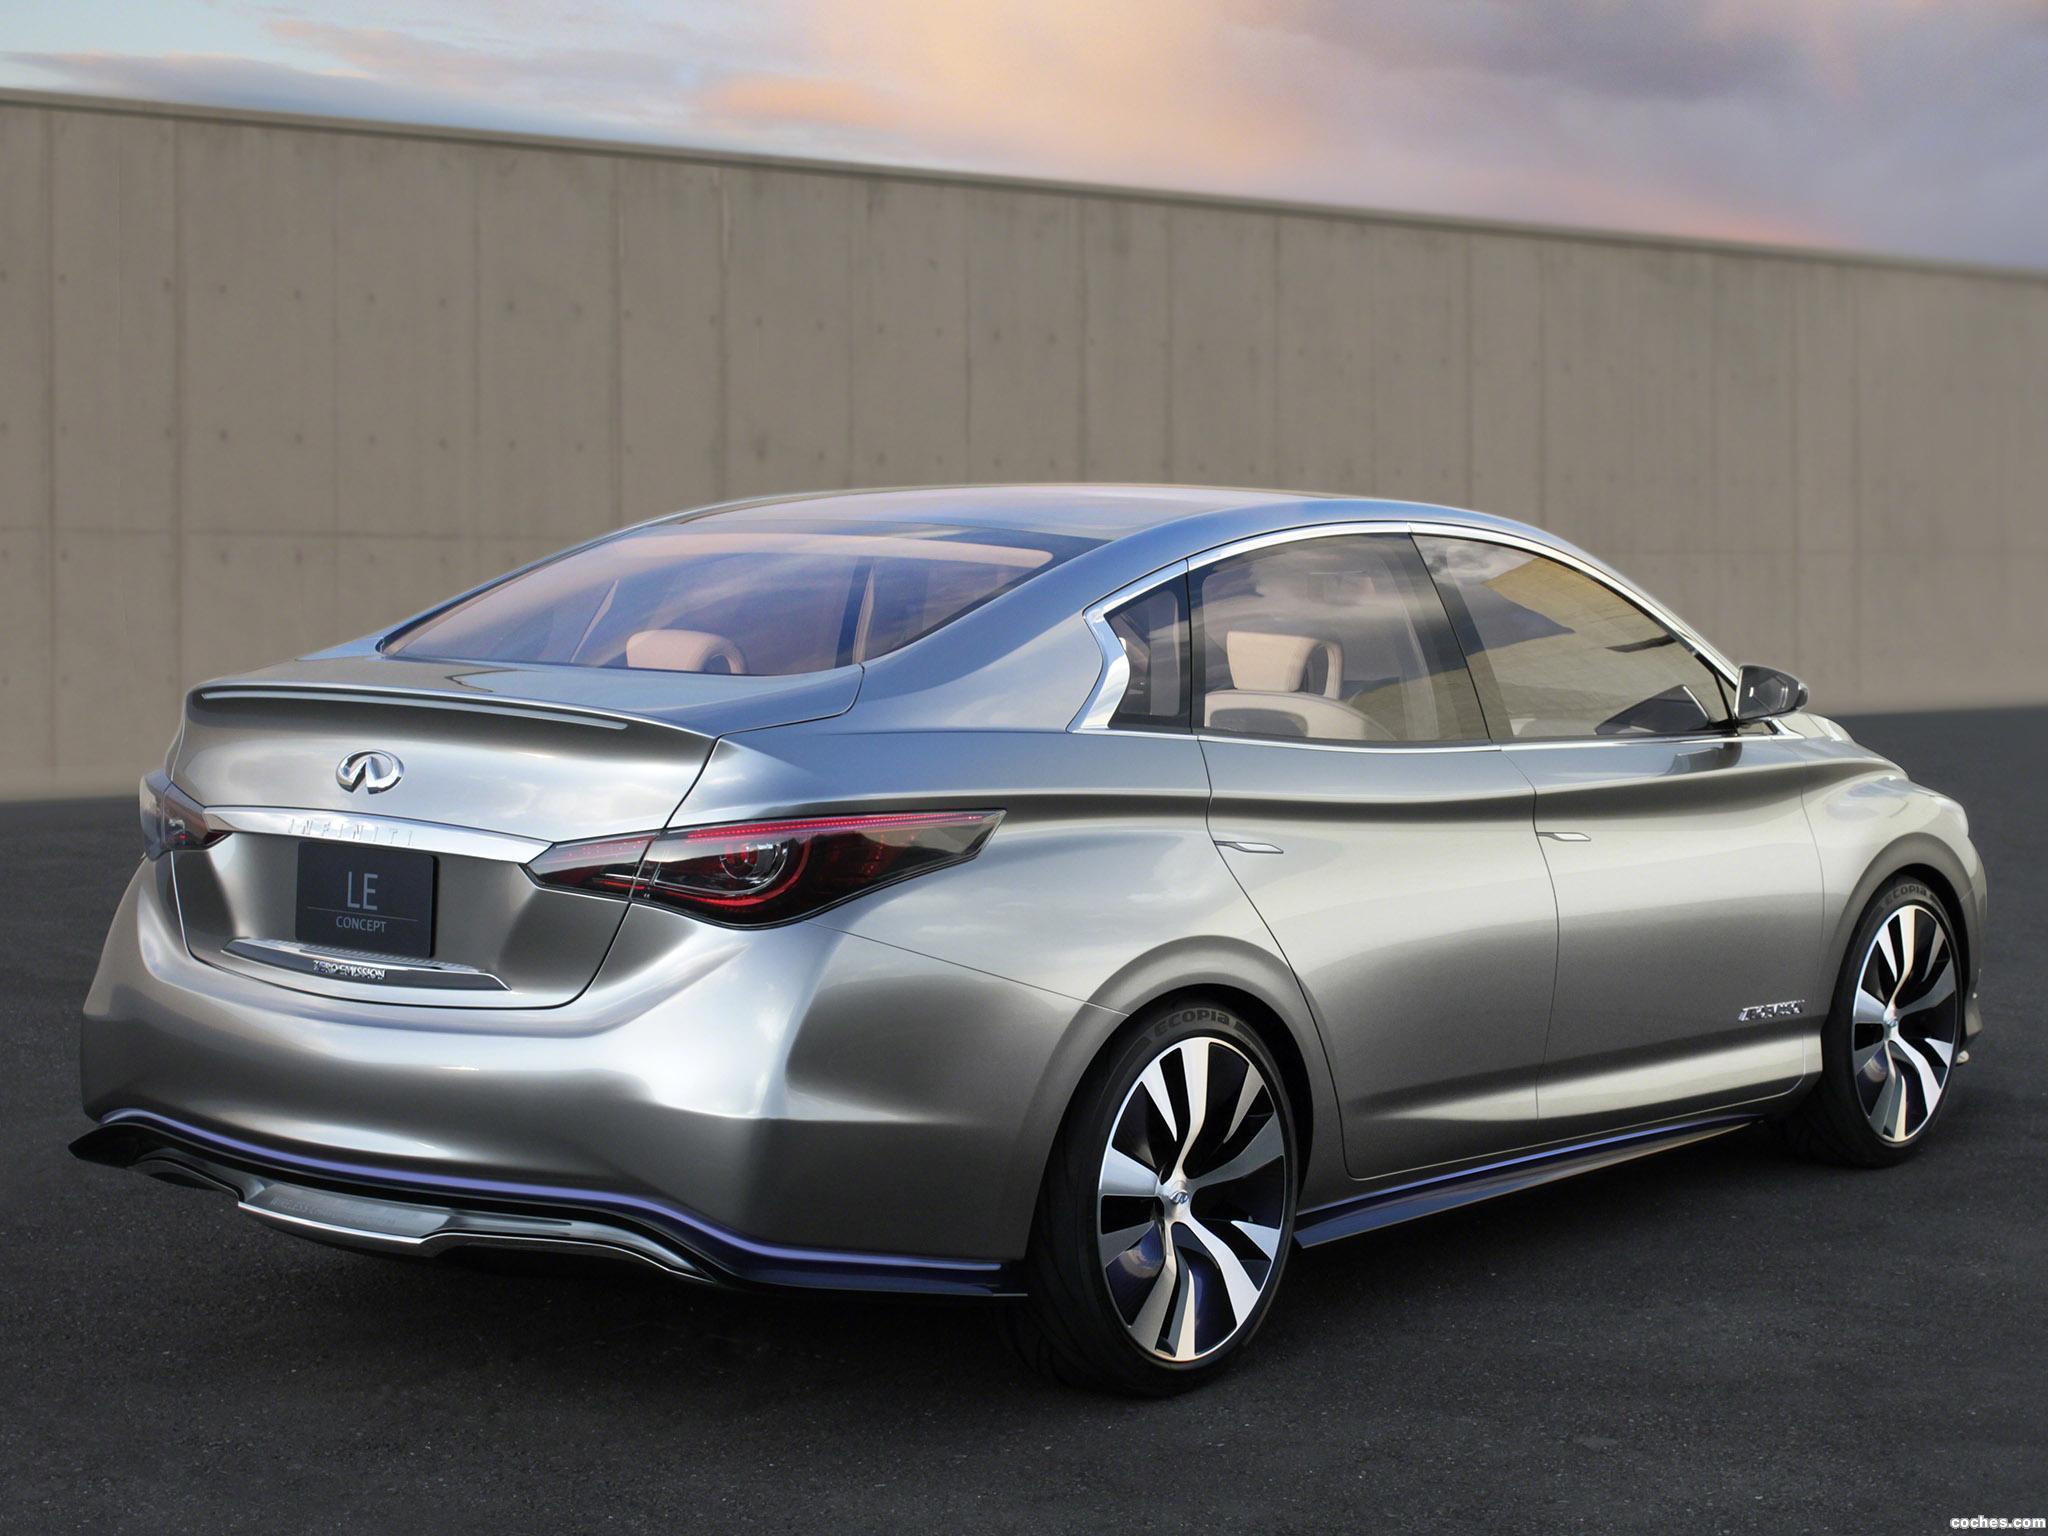 Foto 2 de Infiniti LE Electric Car Concept 2012